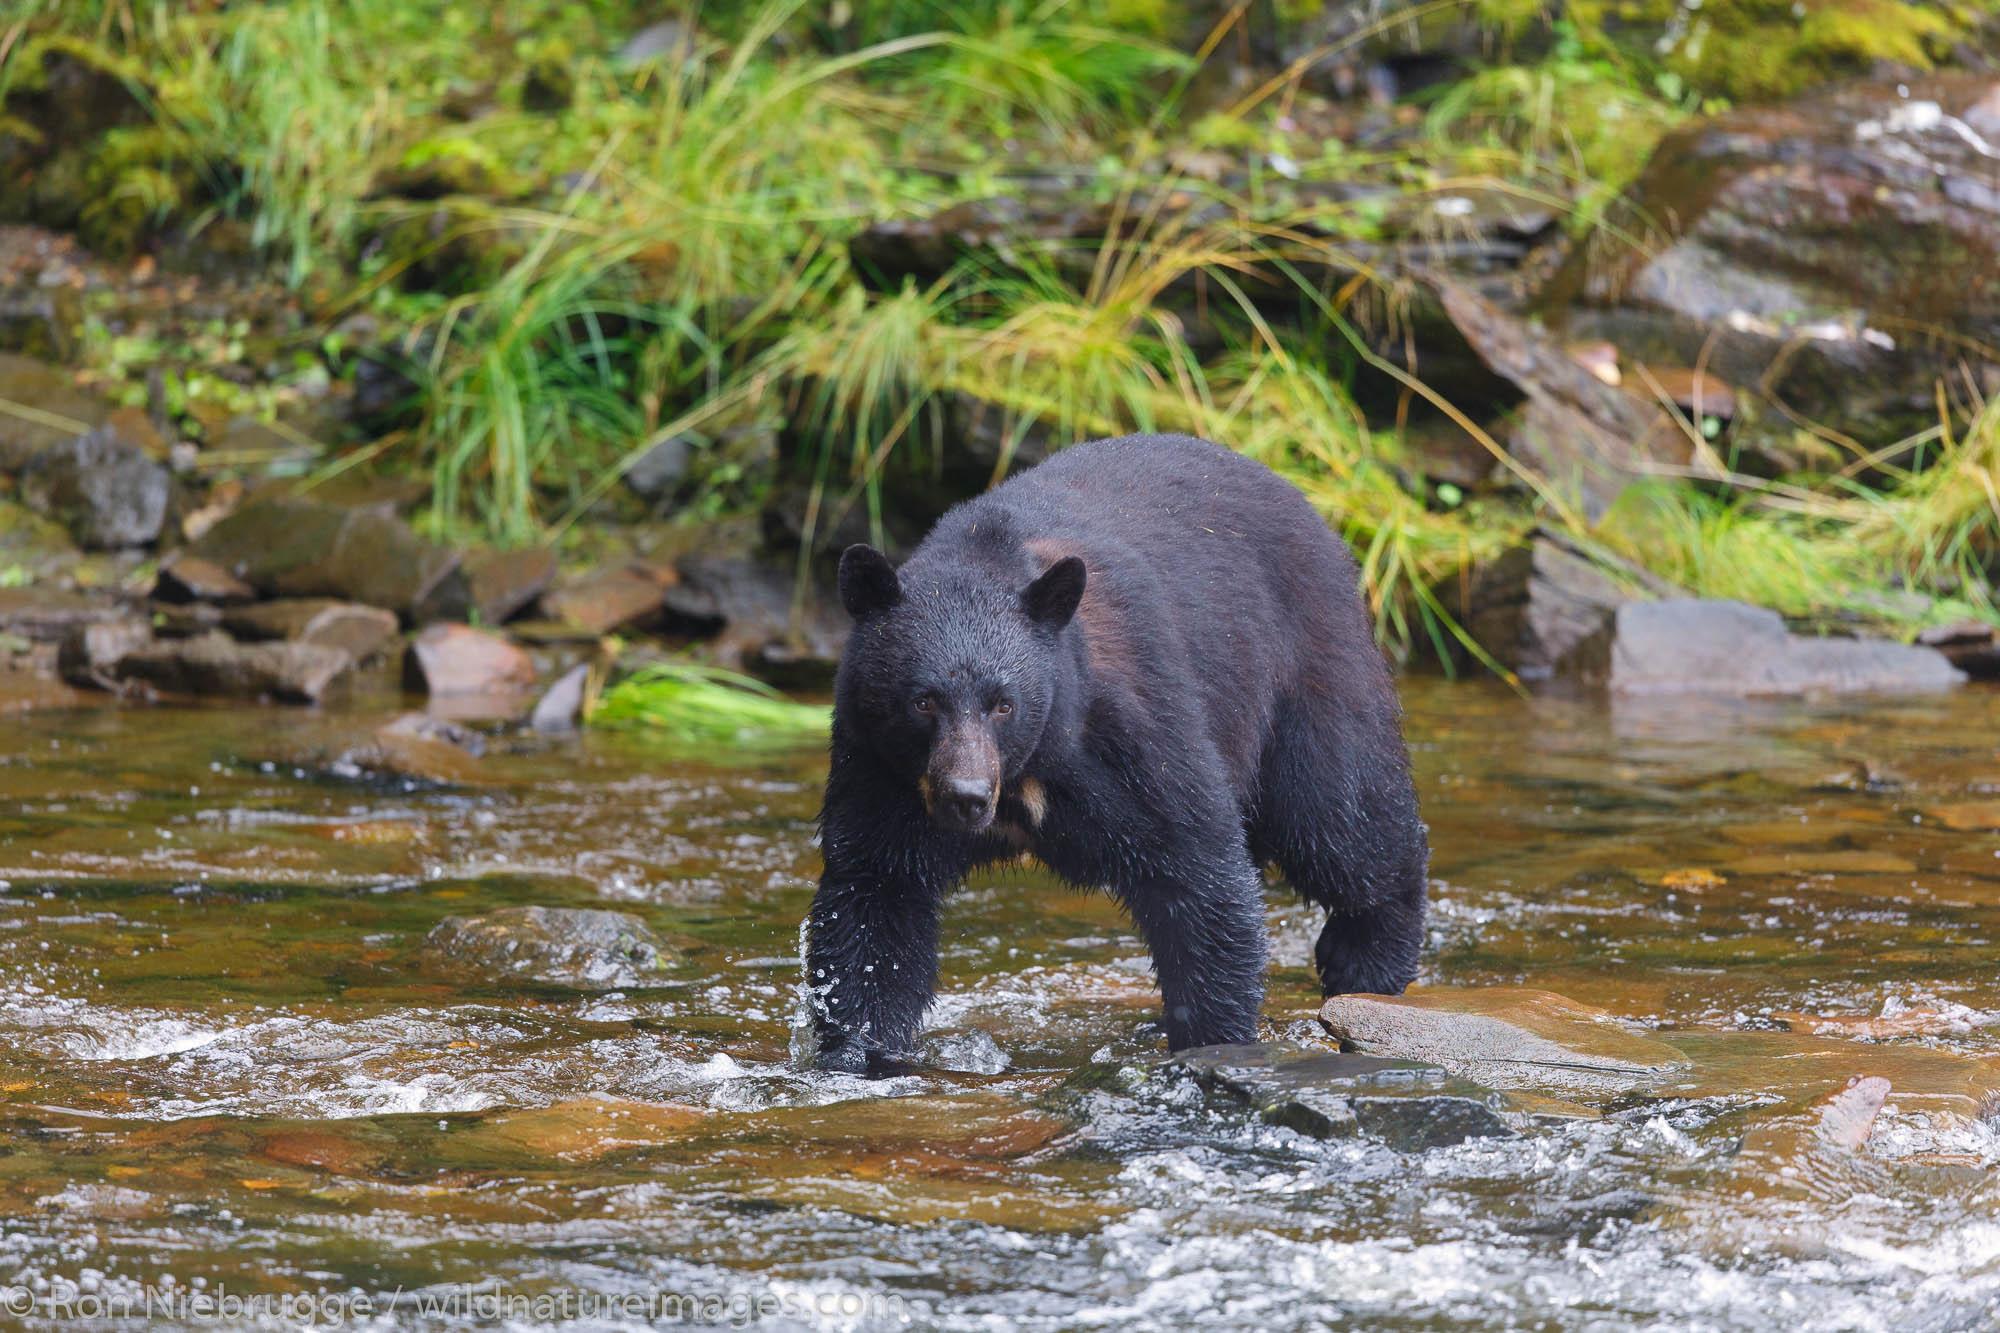 Black bears at the Neets Bay Hatchery,Tongass National Forest, near Ketchikan, Alaska.